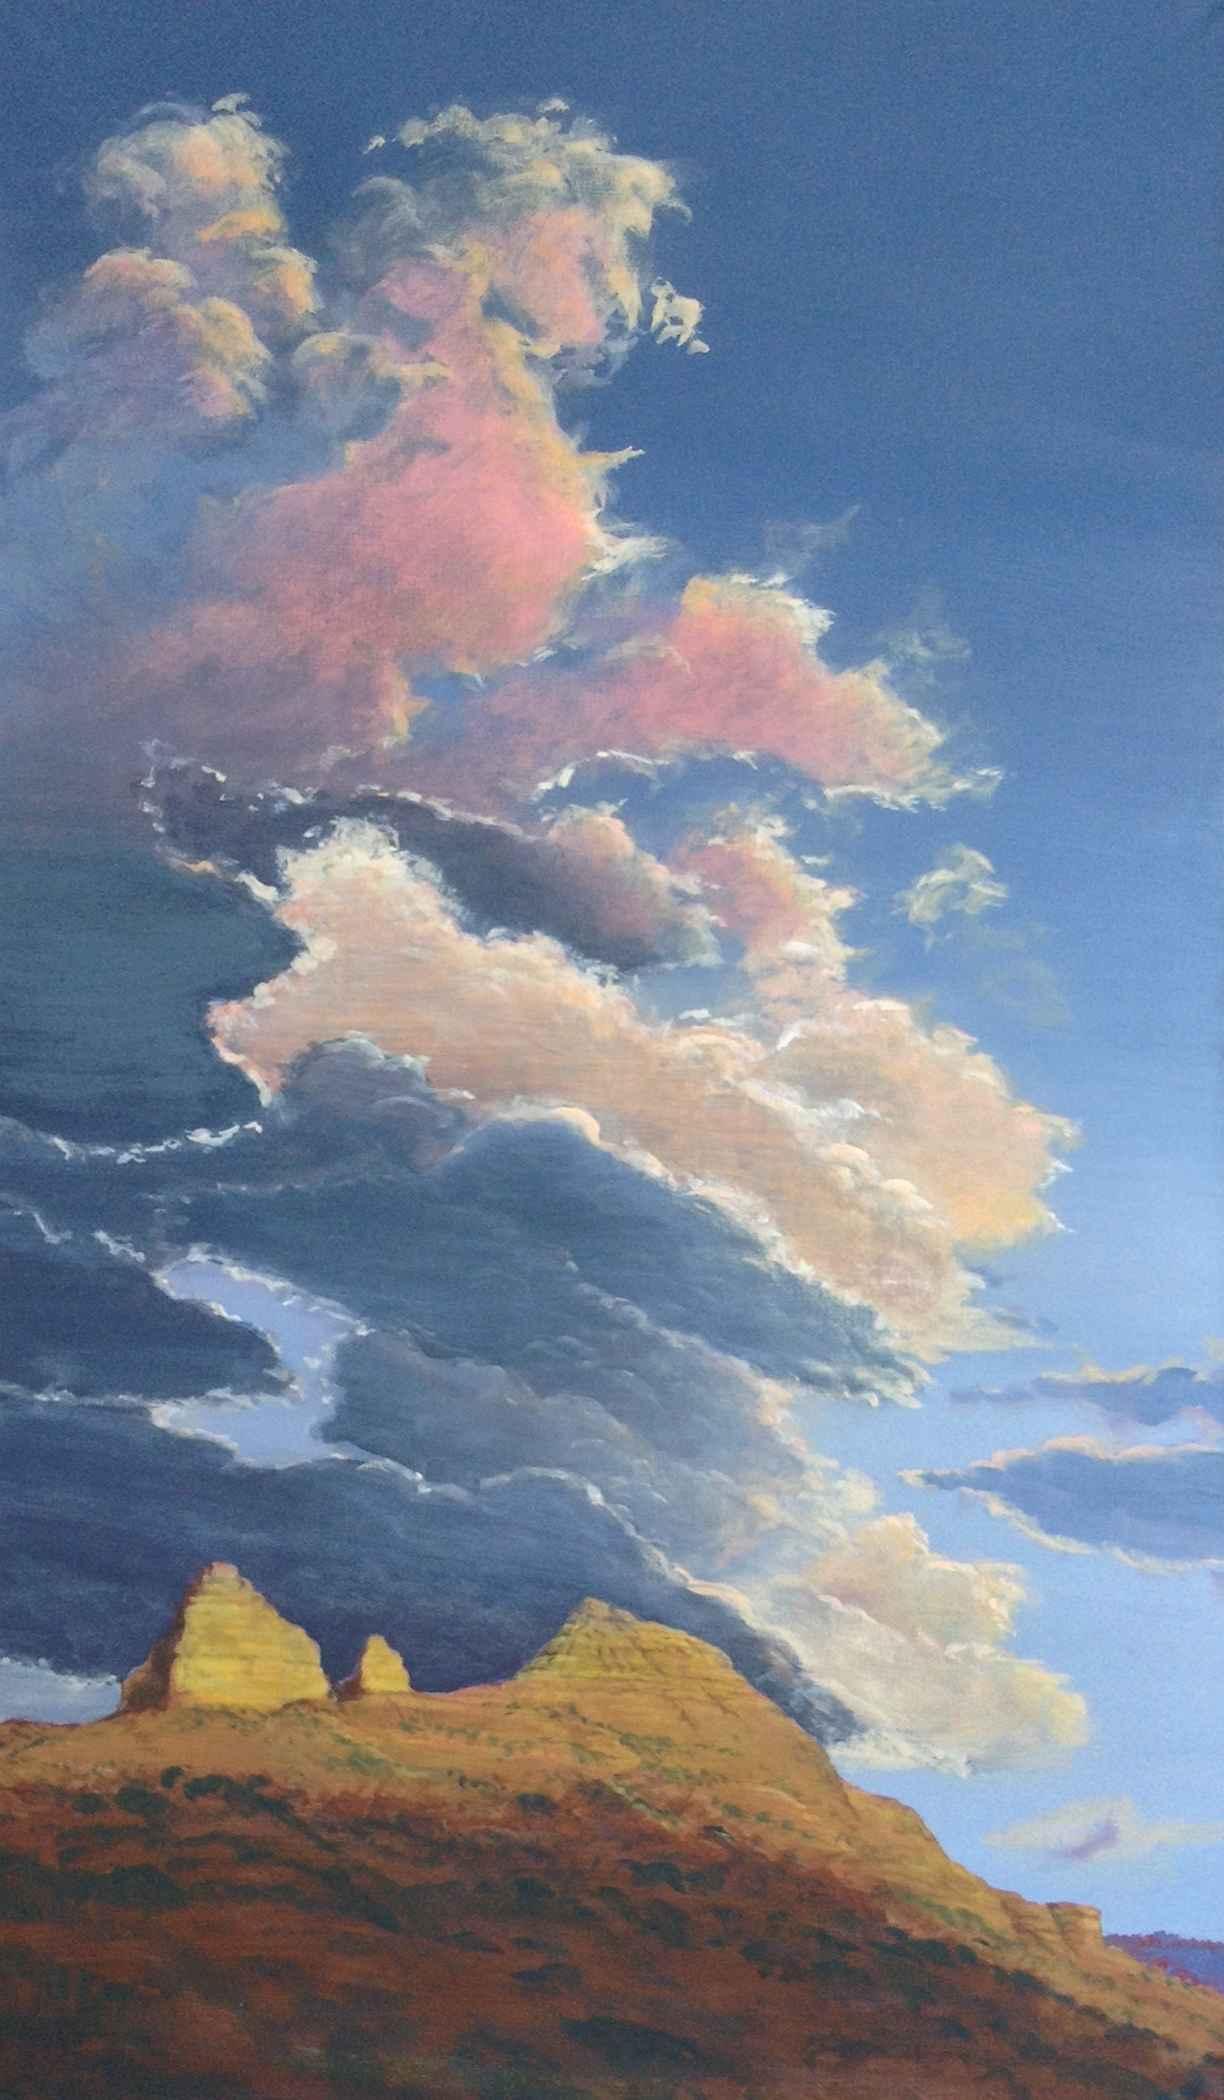 Sedona by  Reagan Word - Masterpiece Online